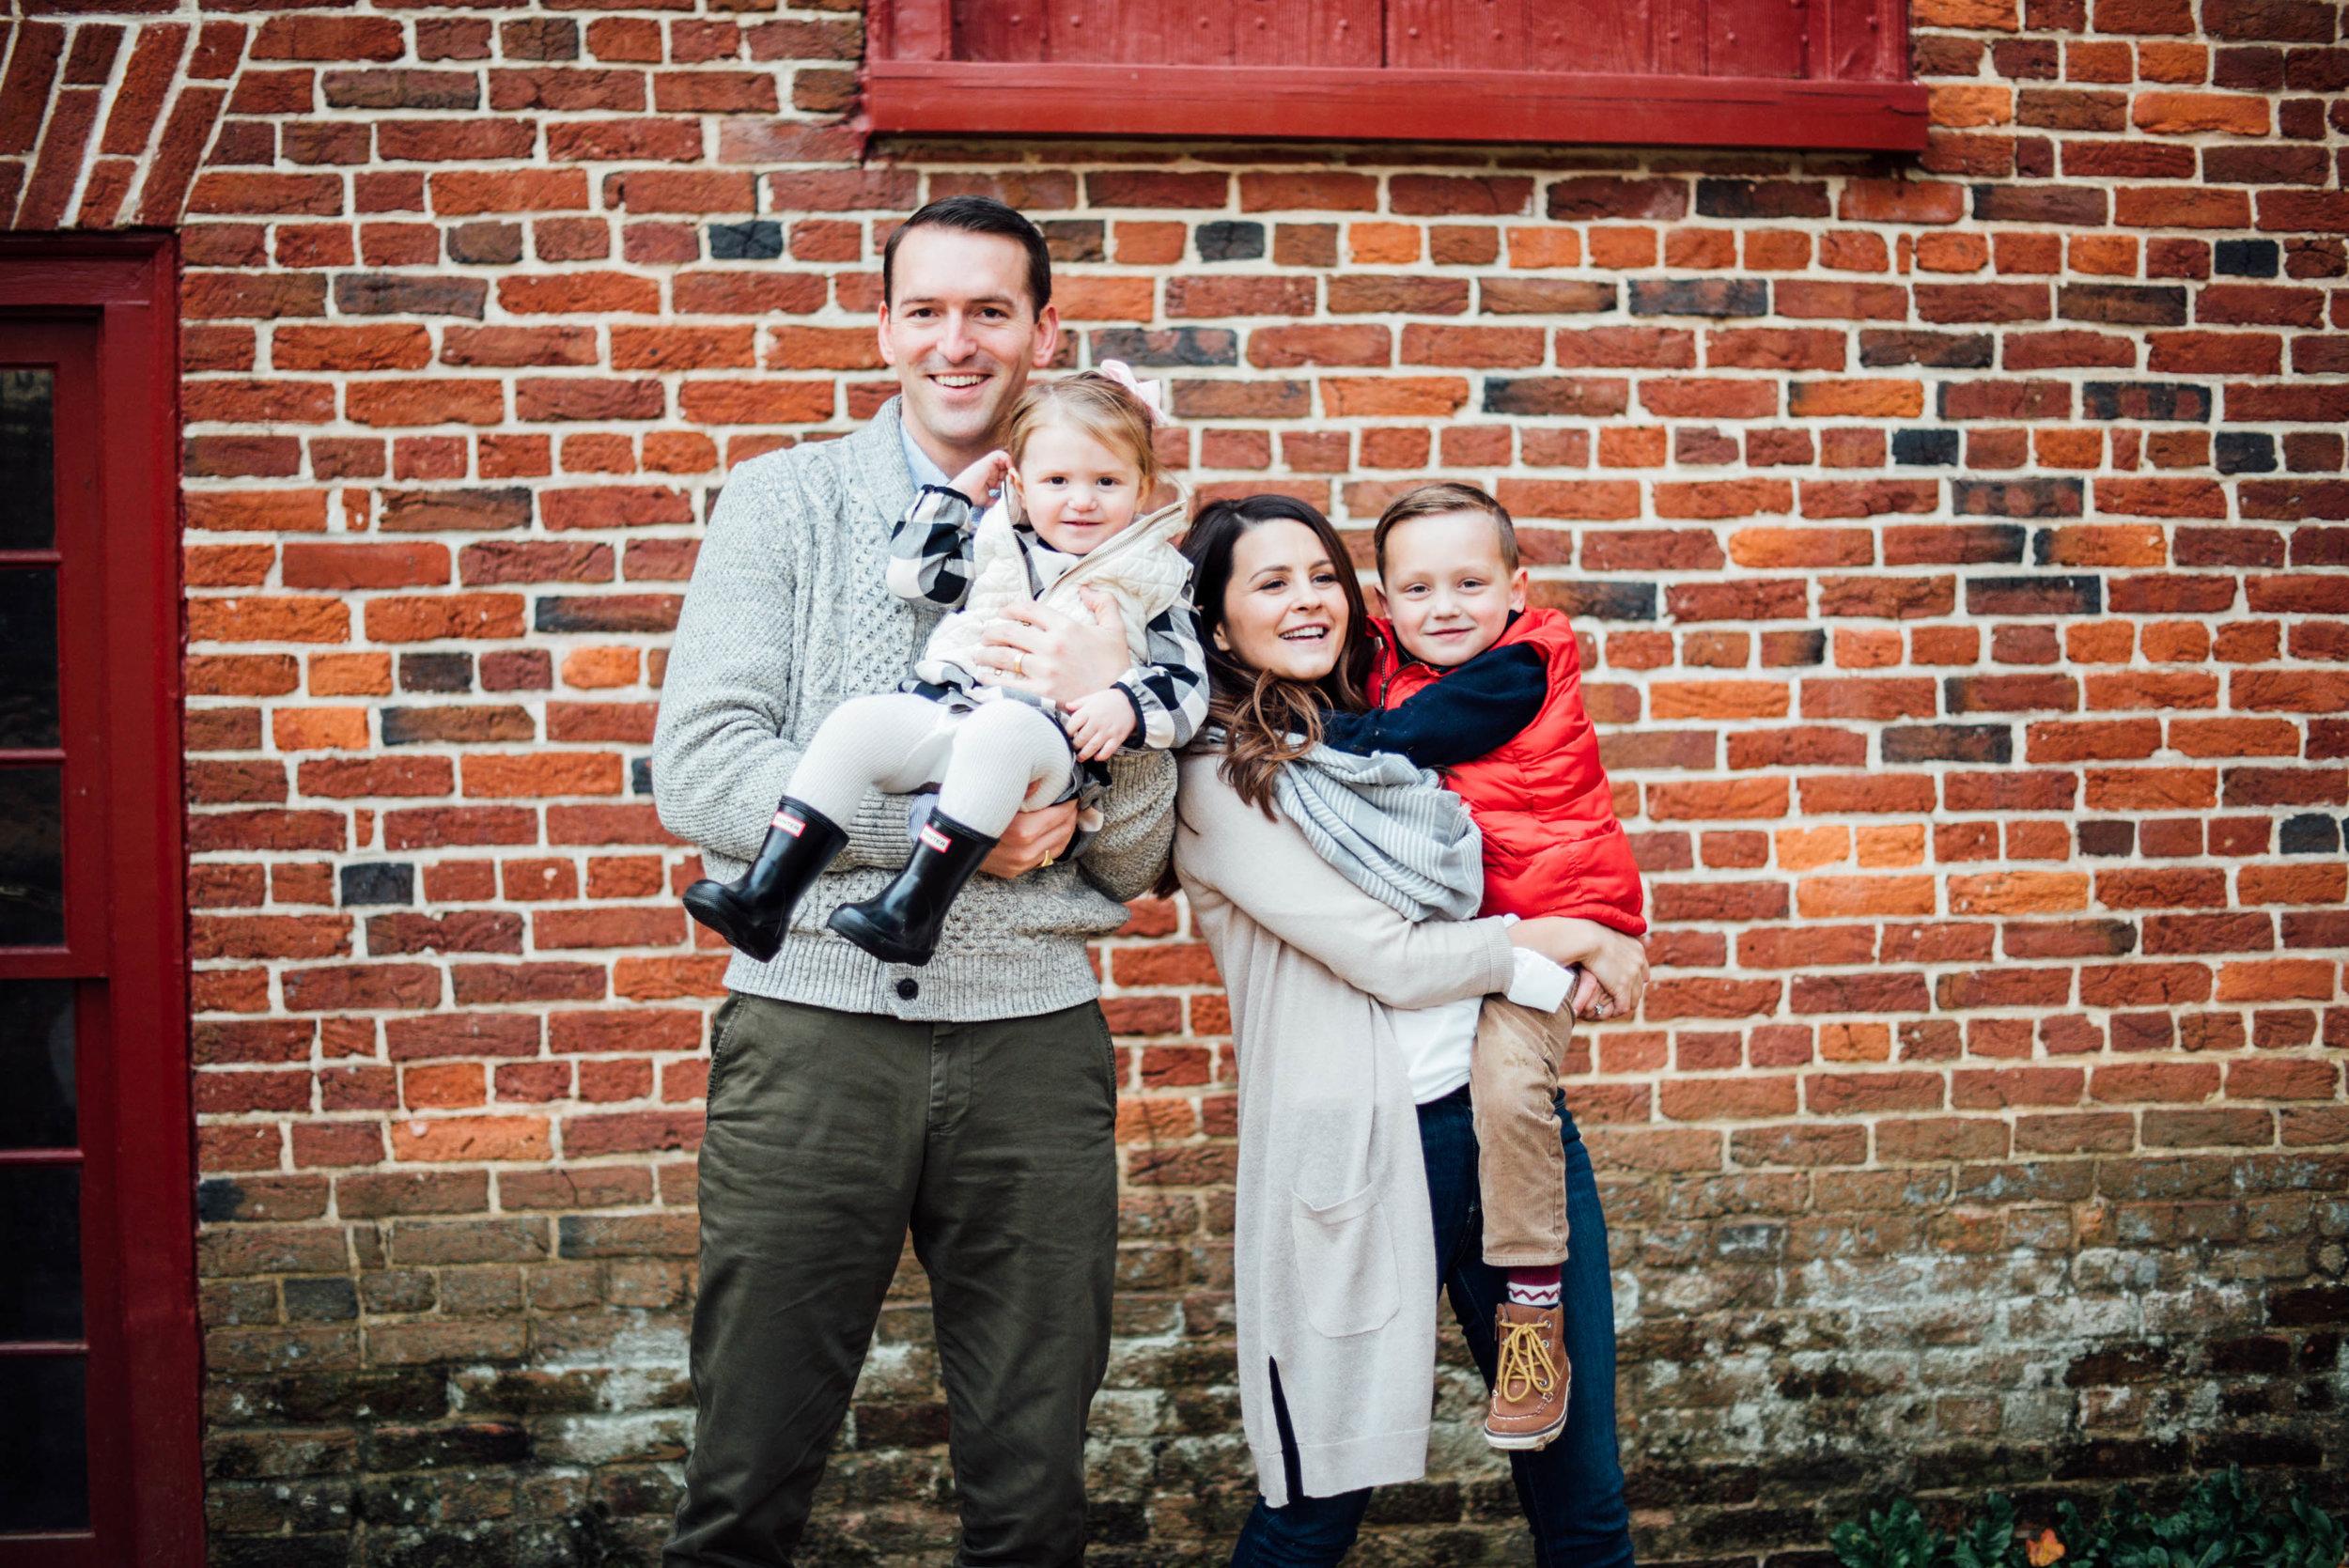 family portrait at colvin mill run park